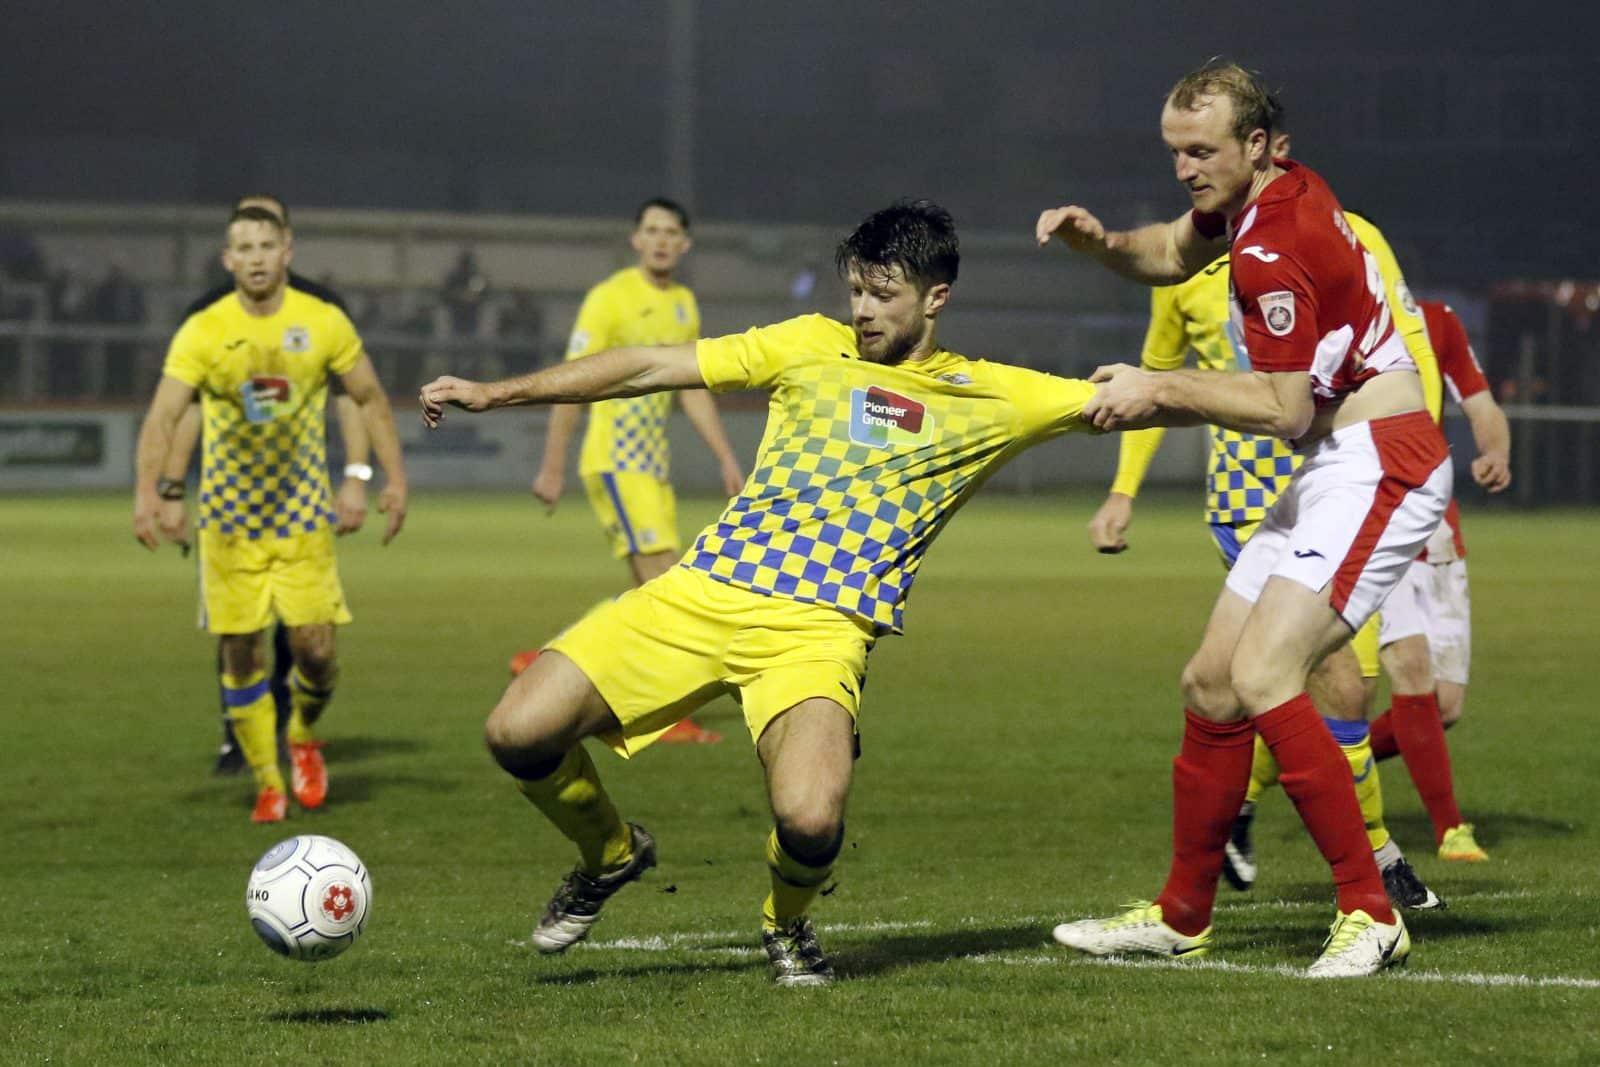 Jason Oswell, Brackley 3-2 Stockport County